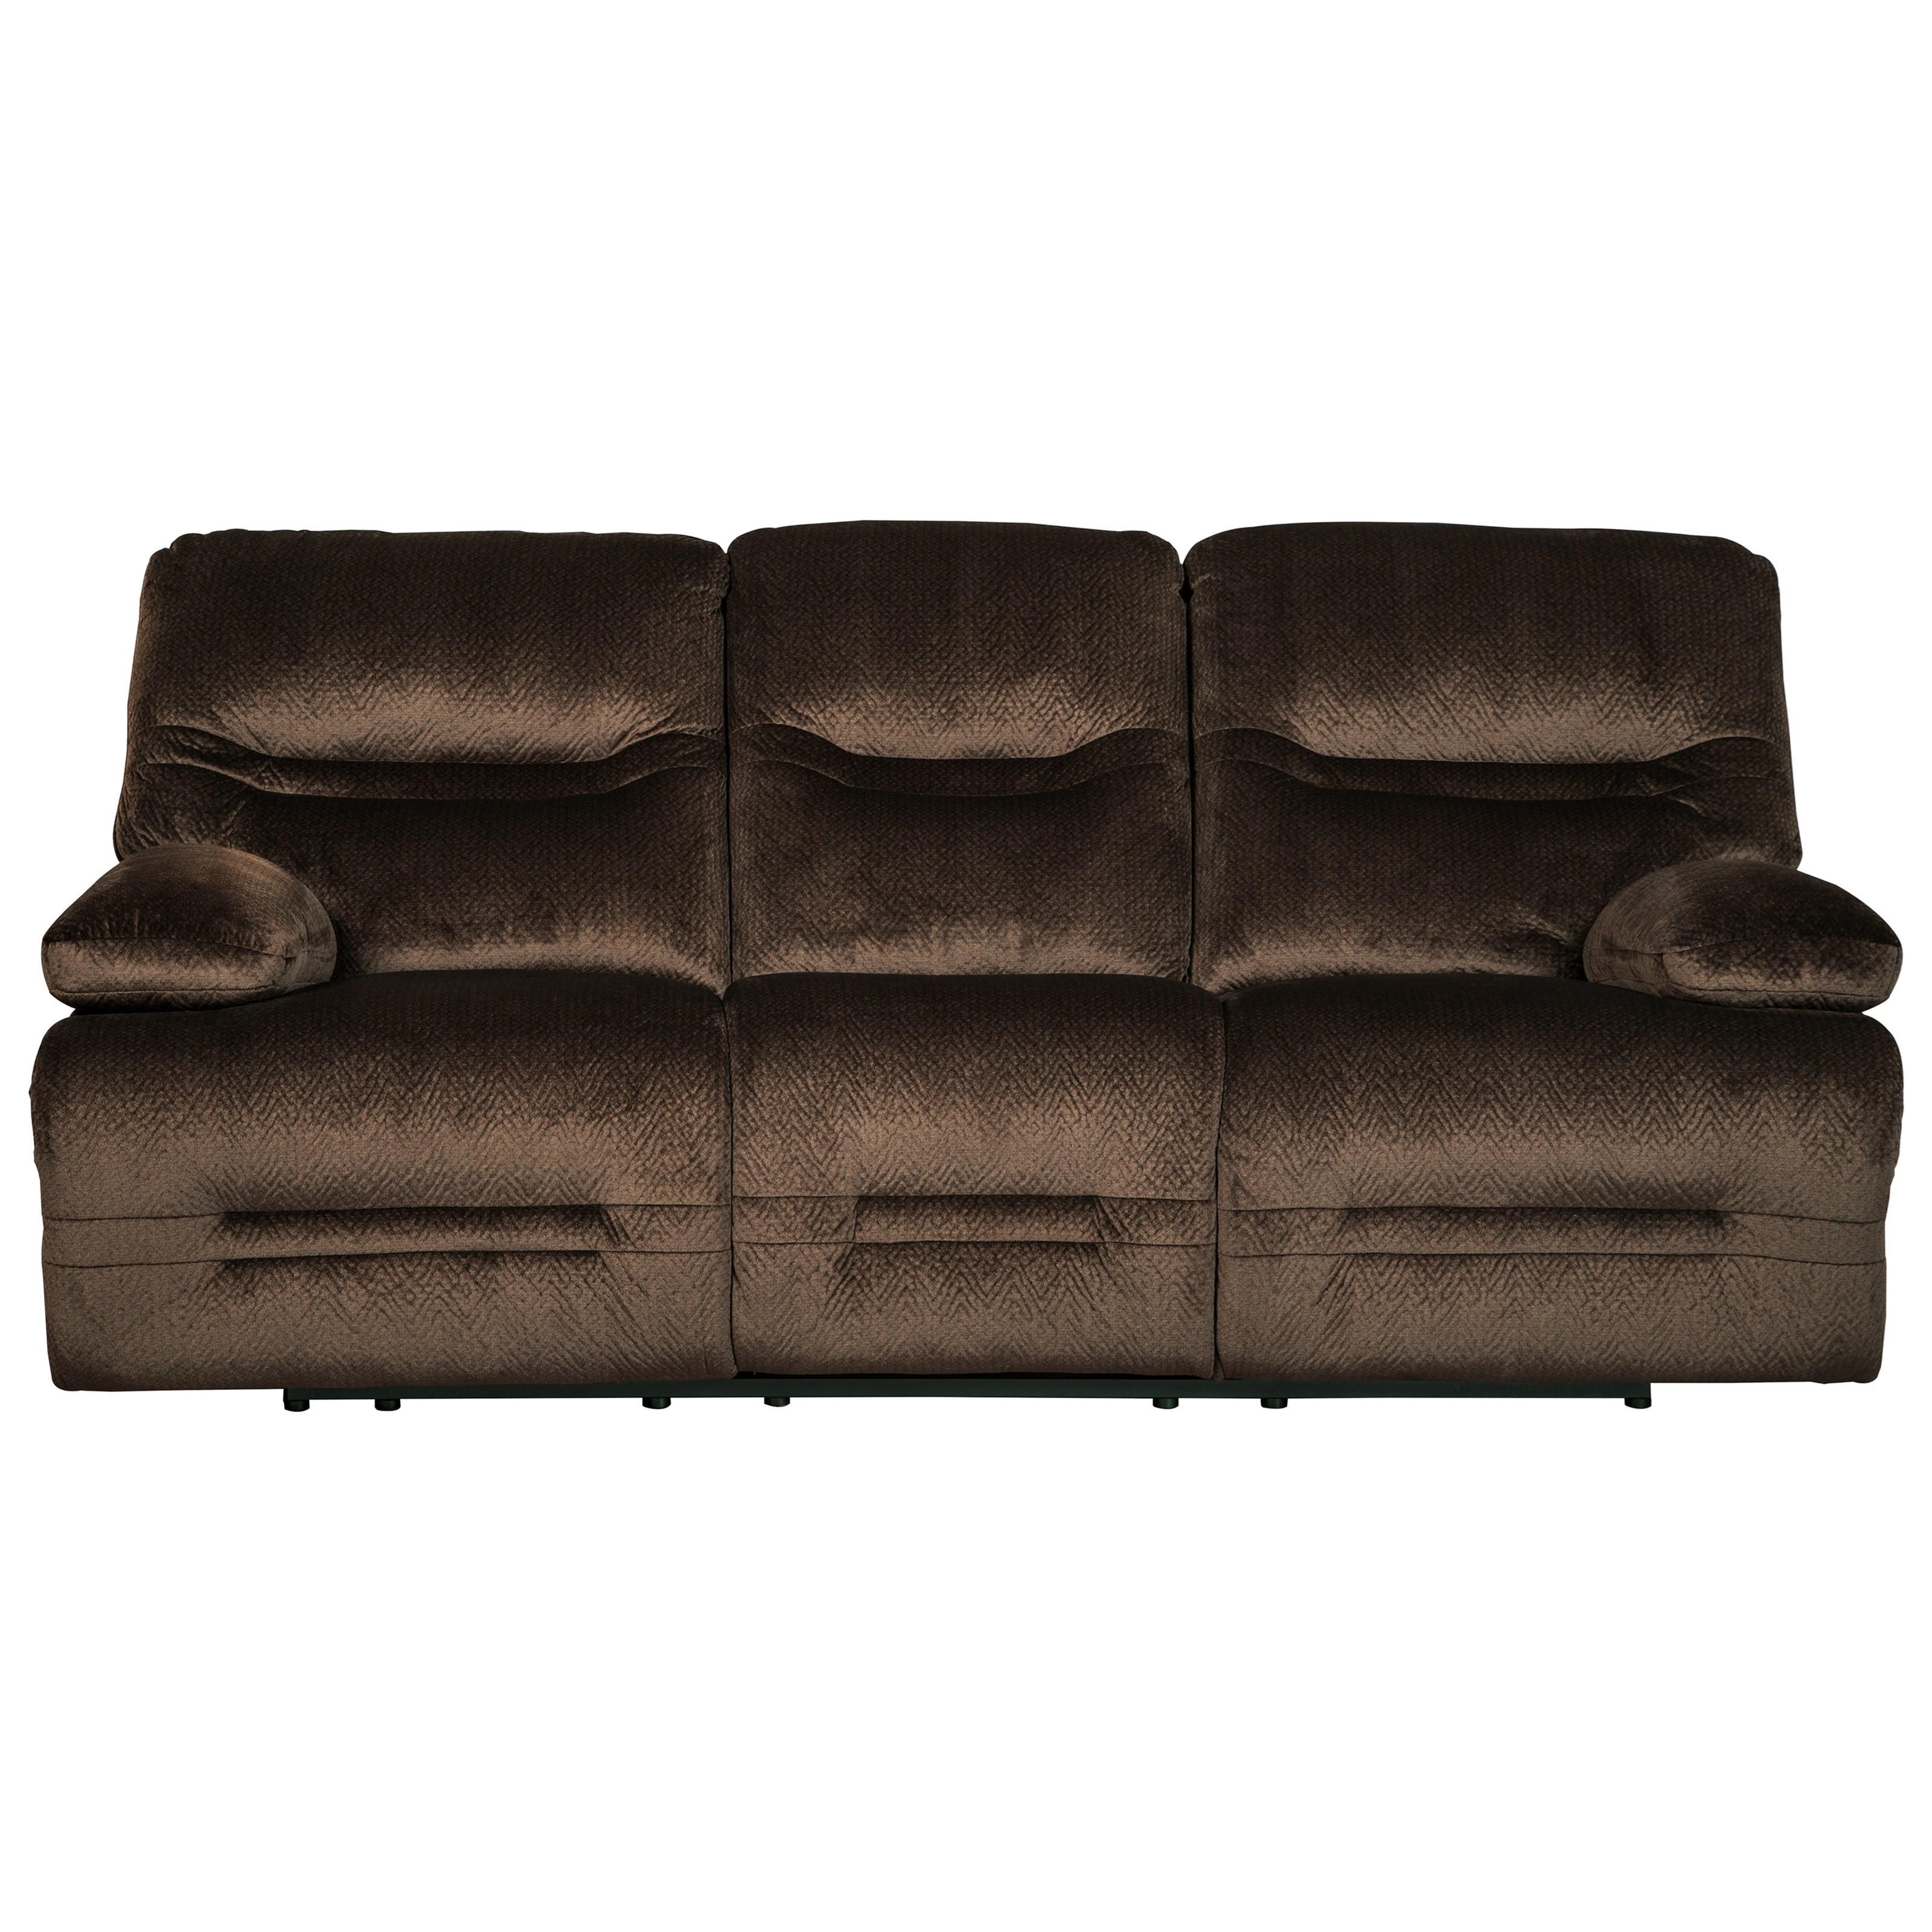 Signature Design By Ashley BrayburnReclining Sofa ...